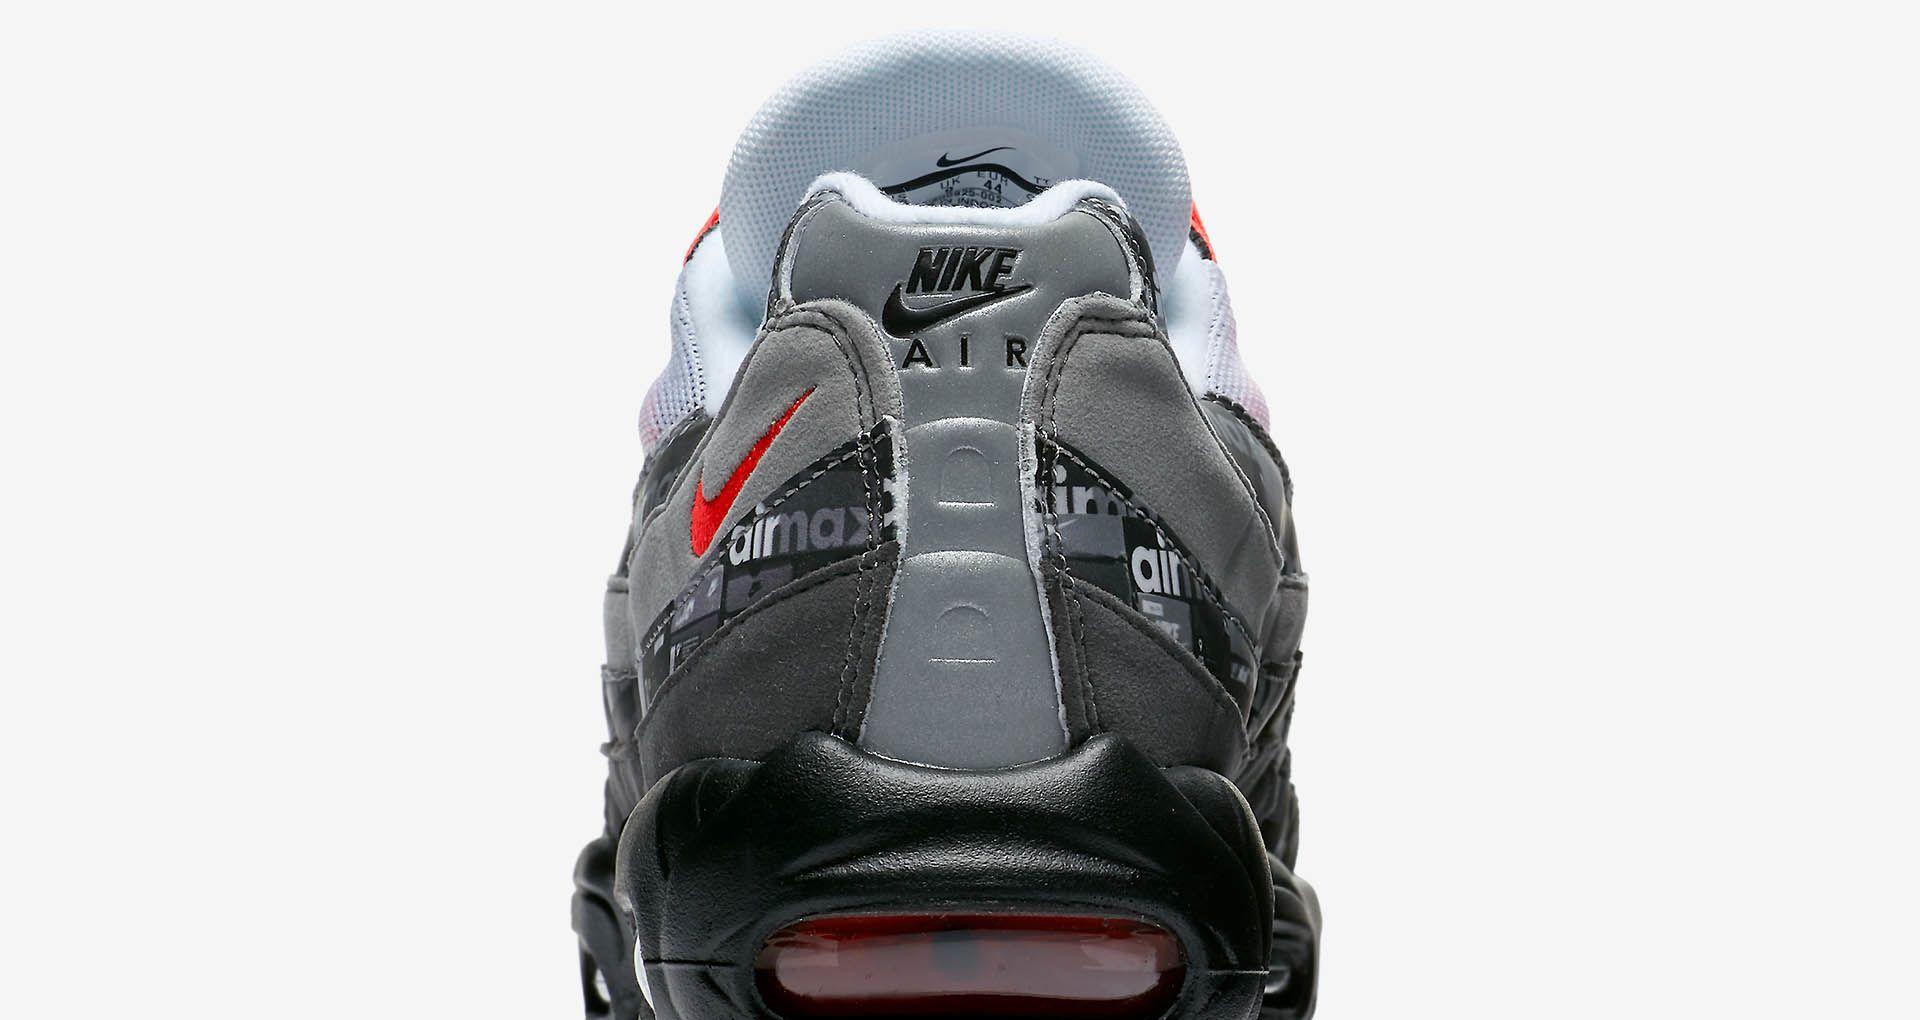 Nike Air Max 95 Atmos 'We Love Nike' Release Date. Nike SNKRS